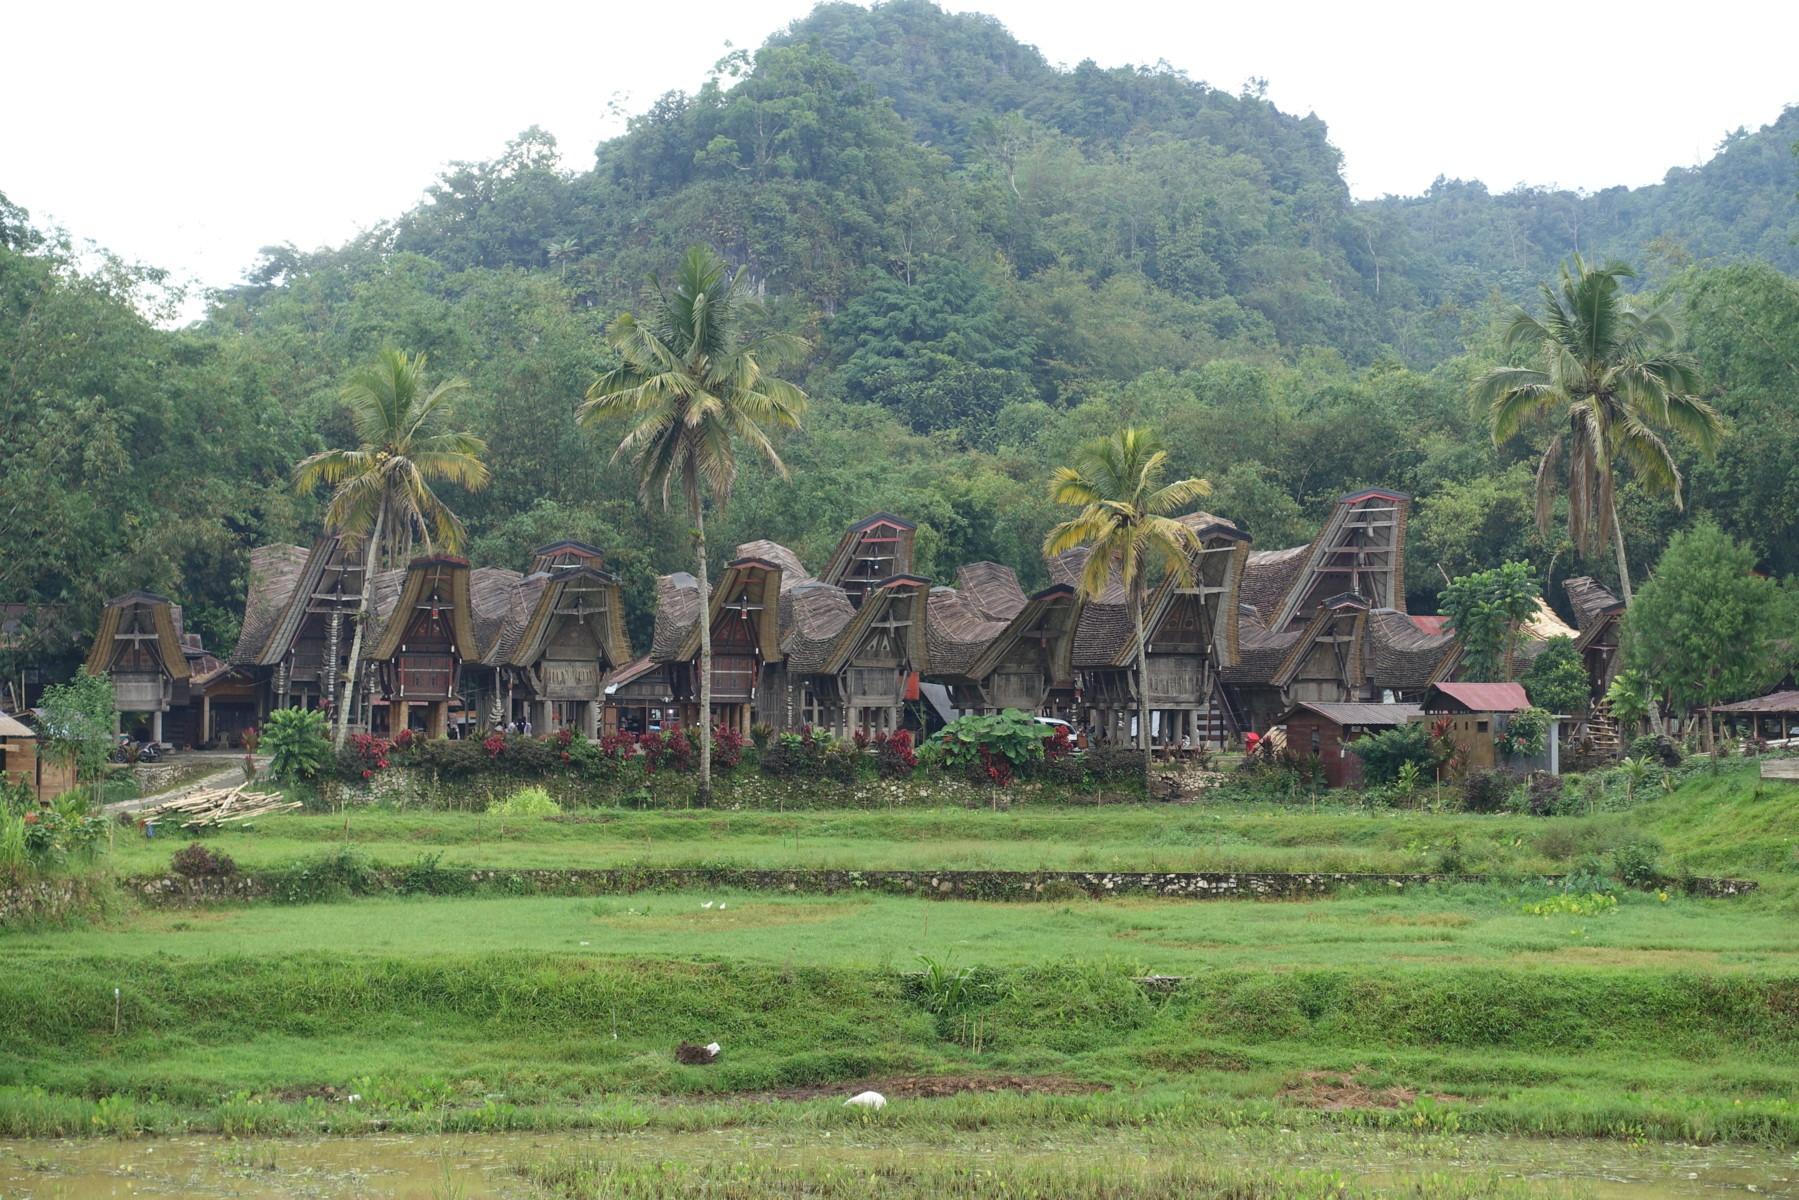 Indonesie_Sulawesi_Toraja_Rantepao DSC05137